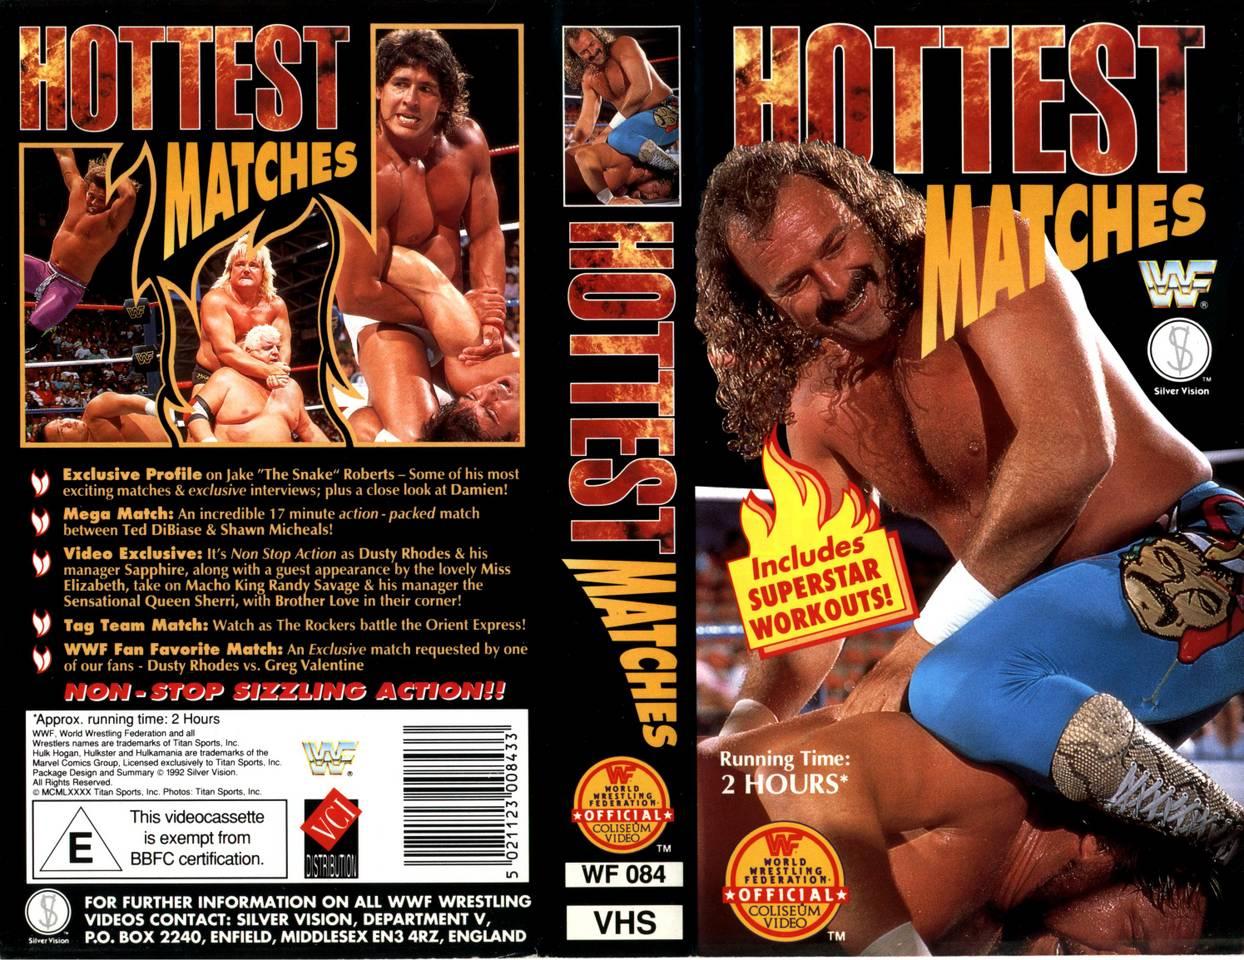 hottestmatches9ue